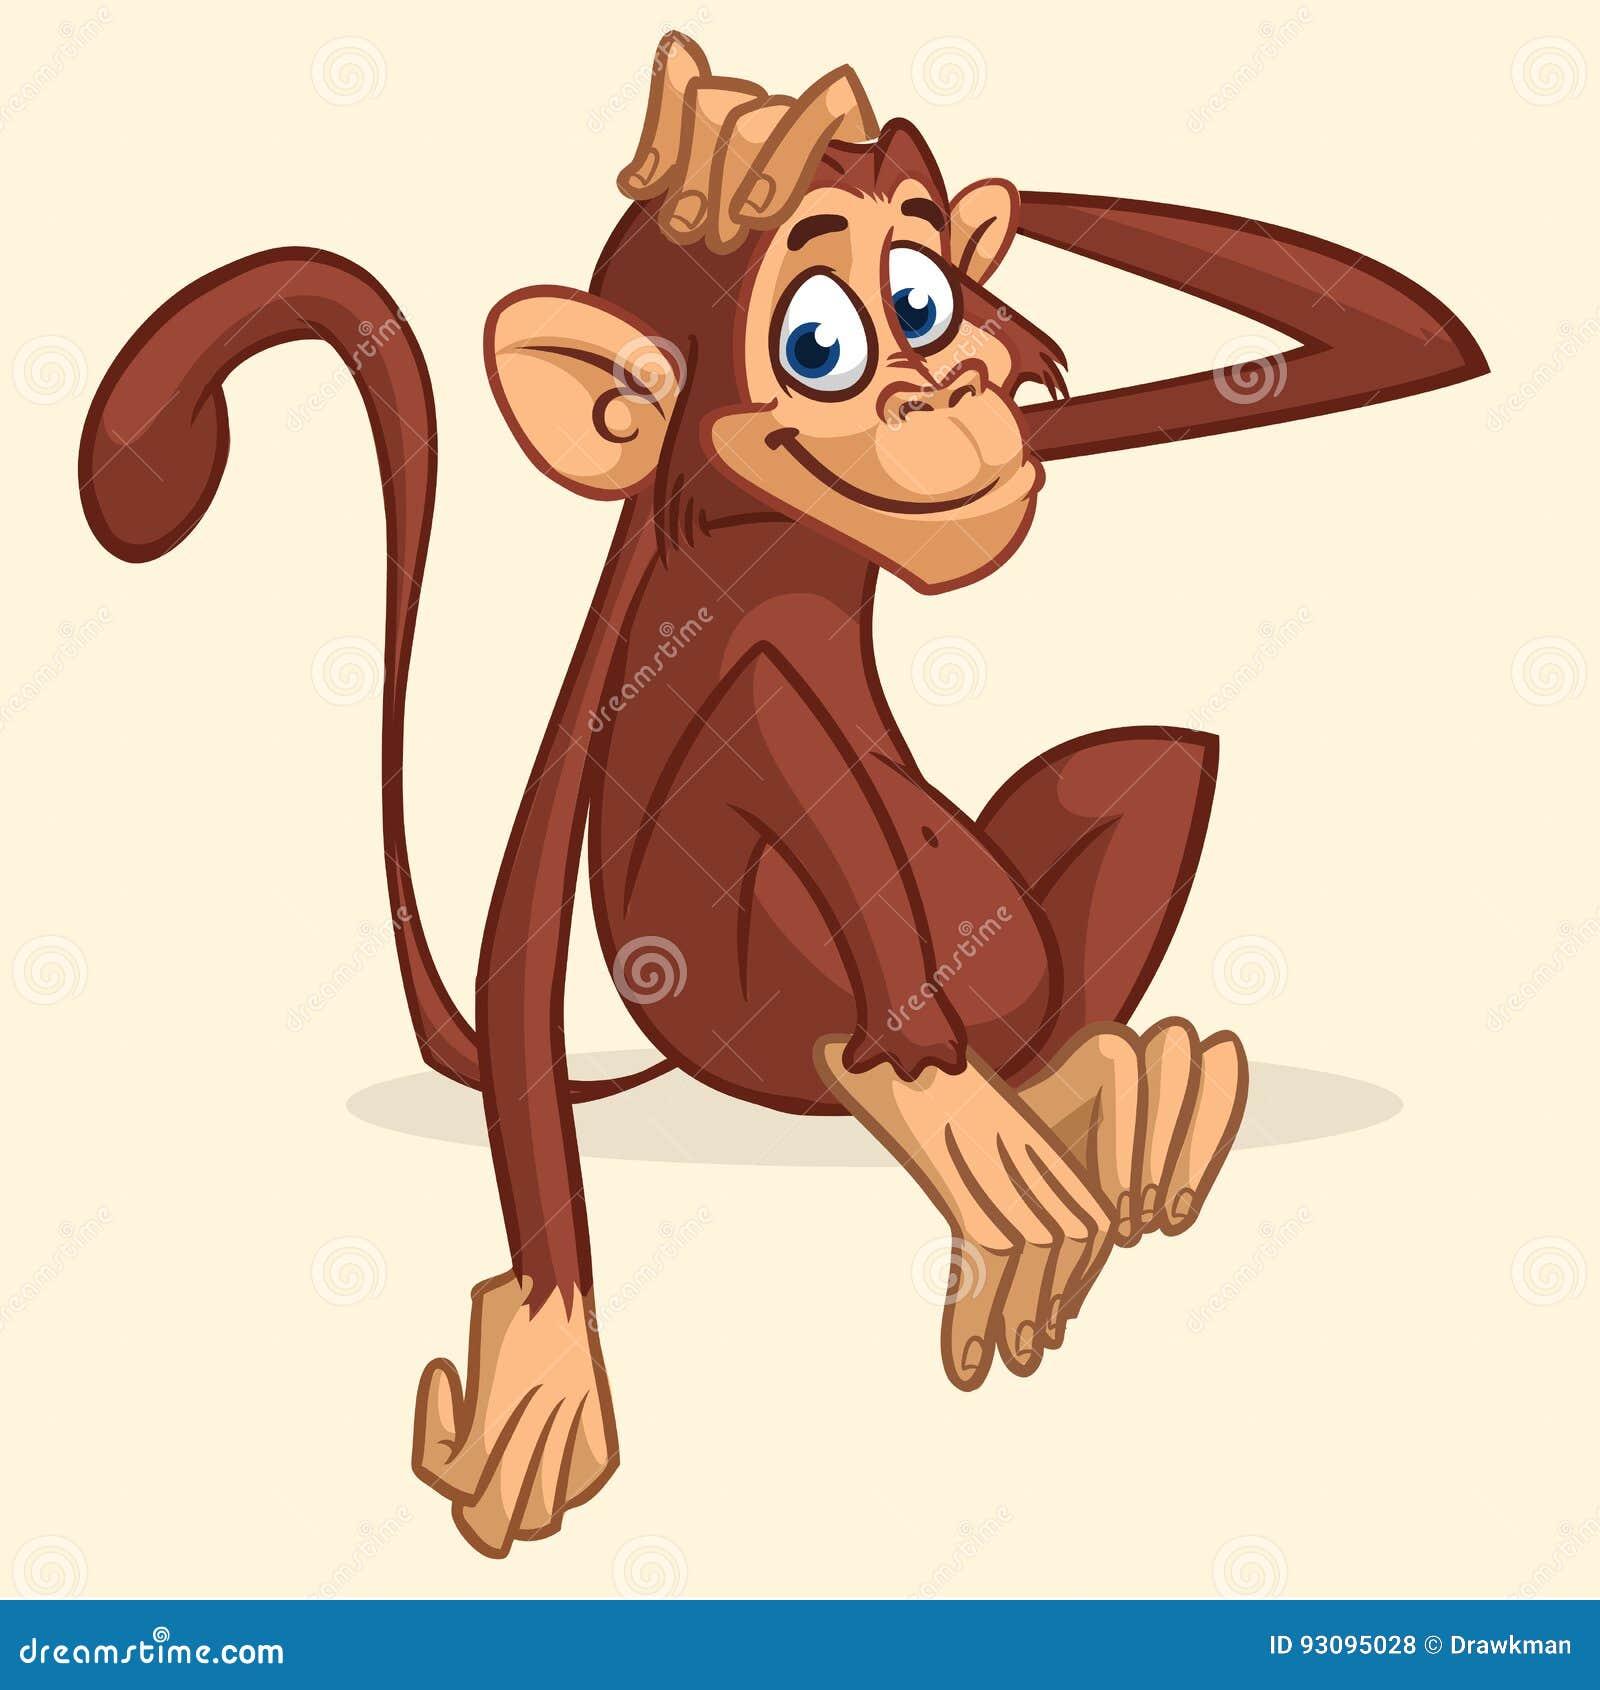 Cute Cartoon Monkey Sitting. Vector Illustration Of Chimpanzee ... for Cute Animated Sticker  58lpg